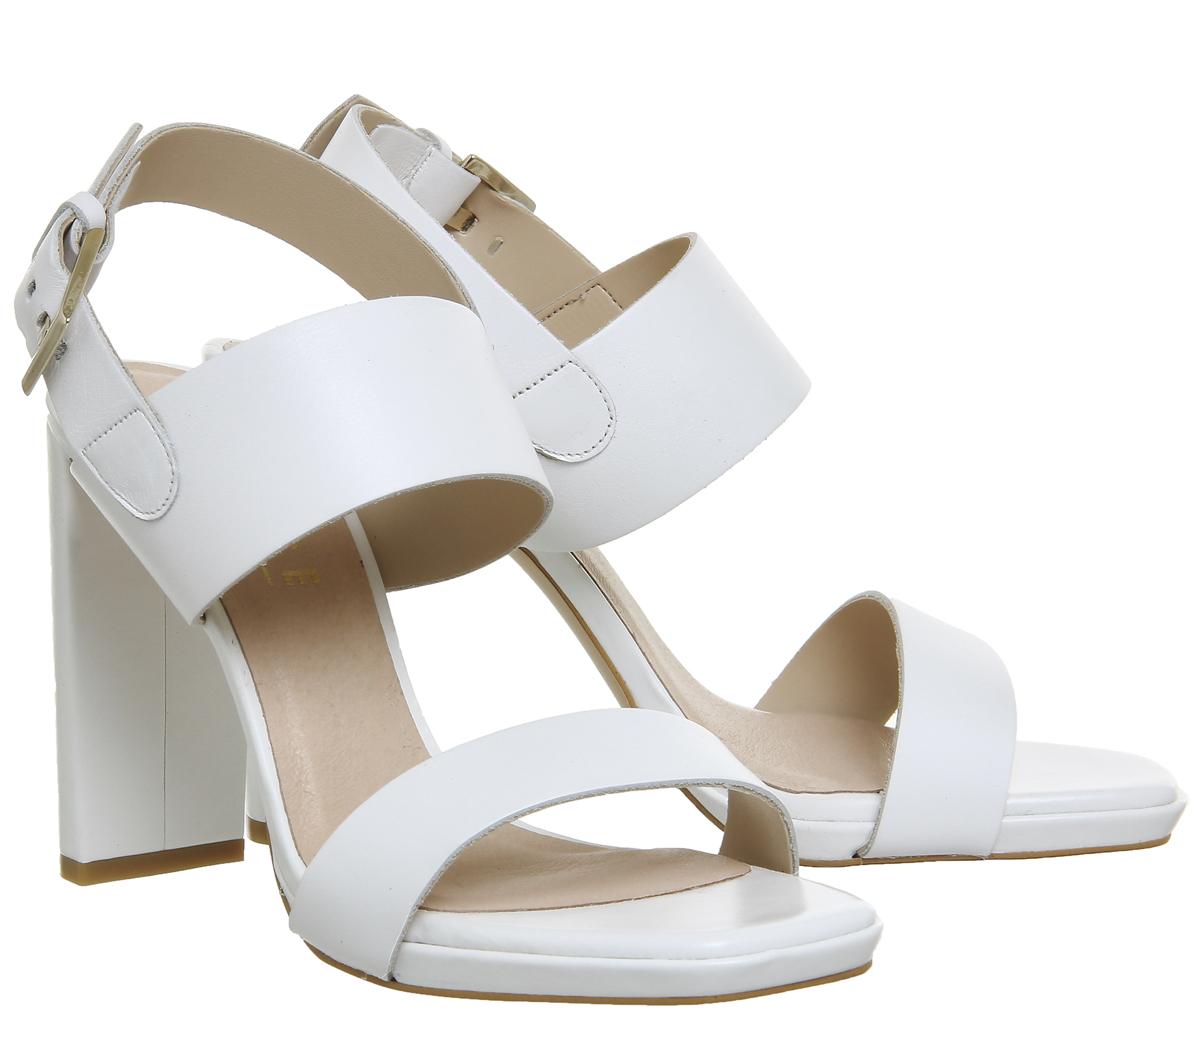 Bridal Shoes Harvey Nichols: Wedding Shoes: The Best Flats And Heels